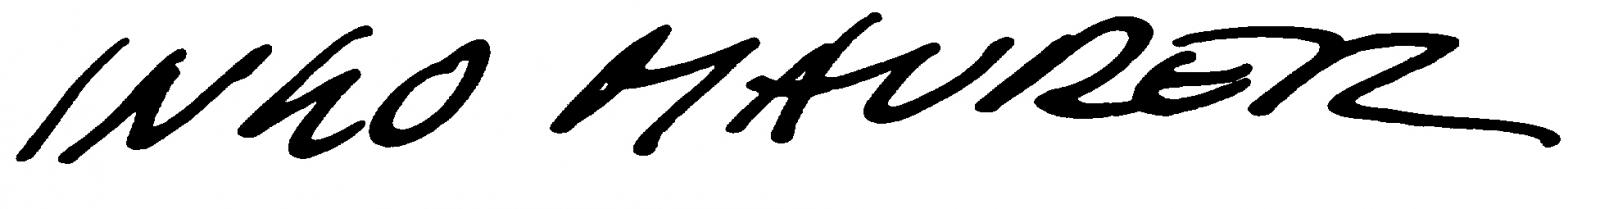 8c8bb00fd84aceb7b46b36f871987378-logo3.jpg